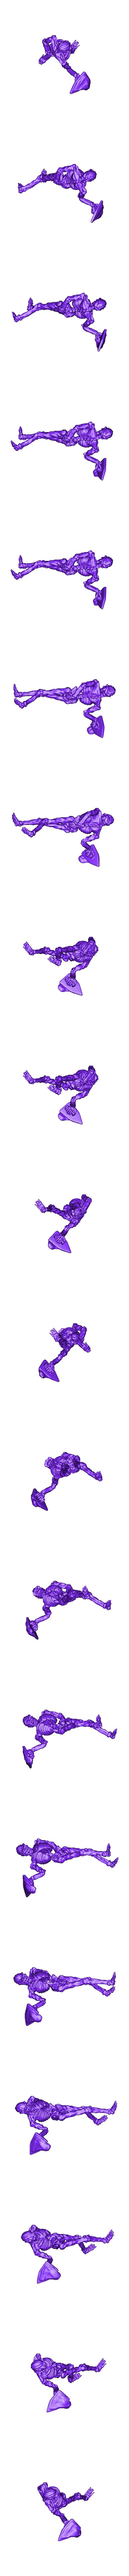 IsOrphansBoss_SkeletonWall.stl Download free STL file Is Orphans, Boss. • 3D print model, asininedave